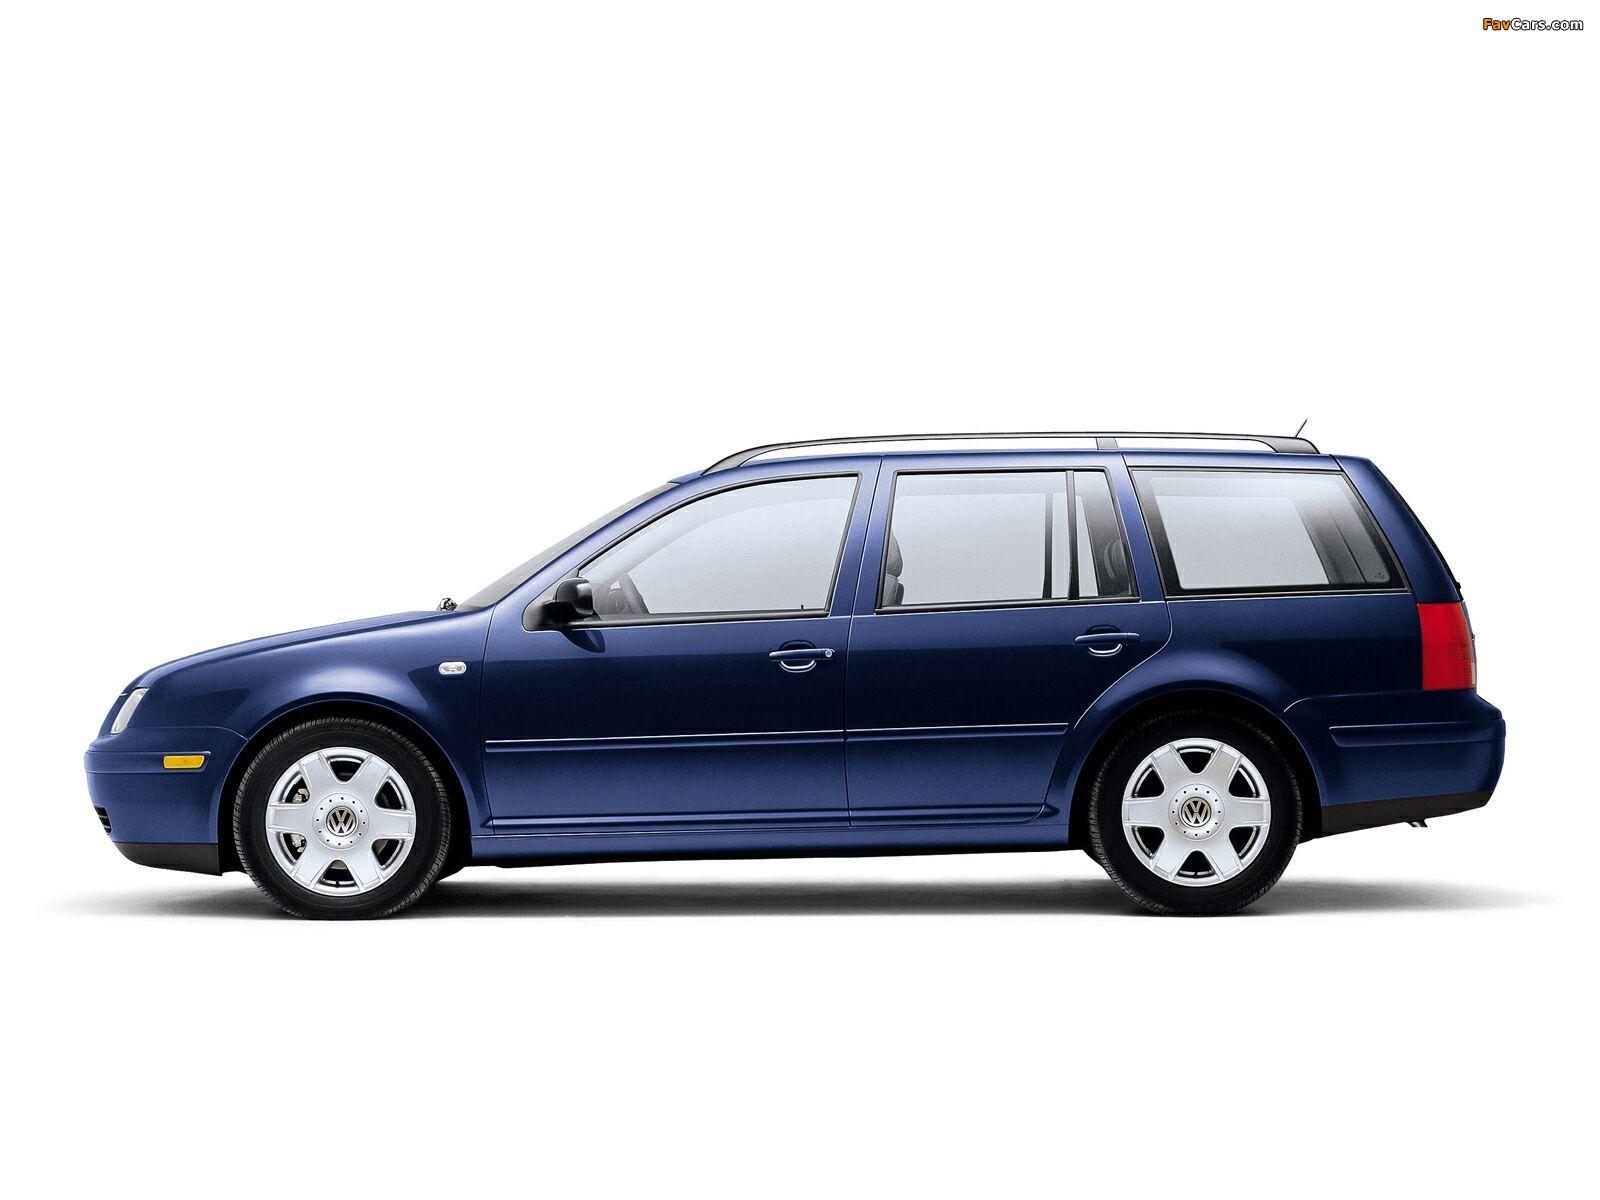 volkswagen jetta wagon iv 1999�2005 images 1600x1200